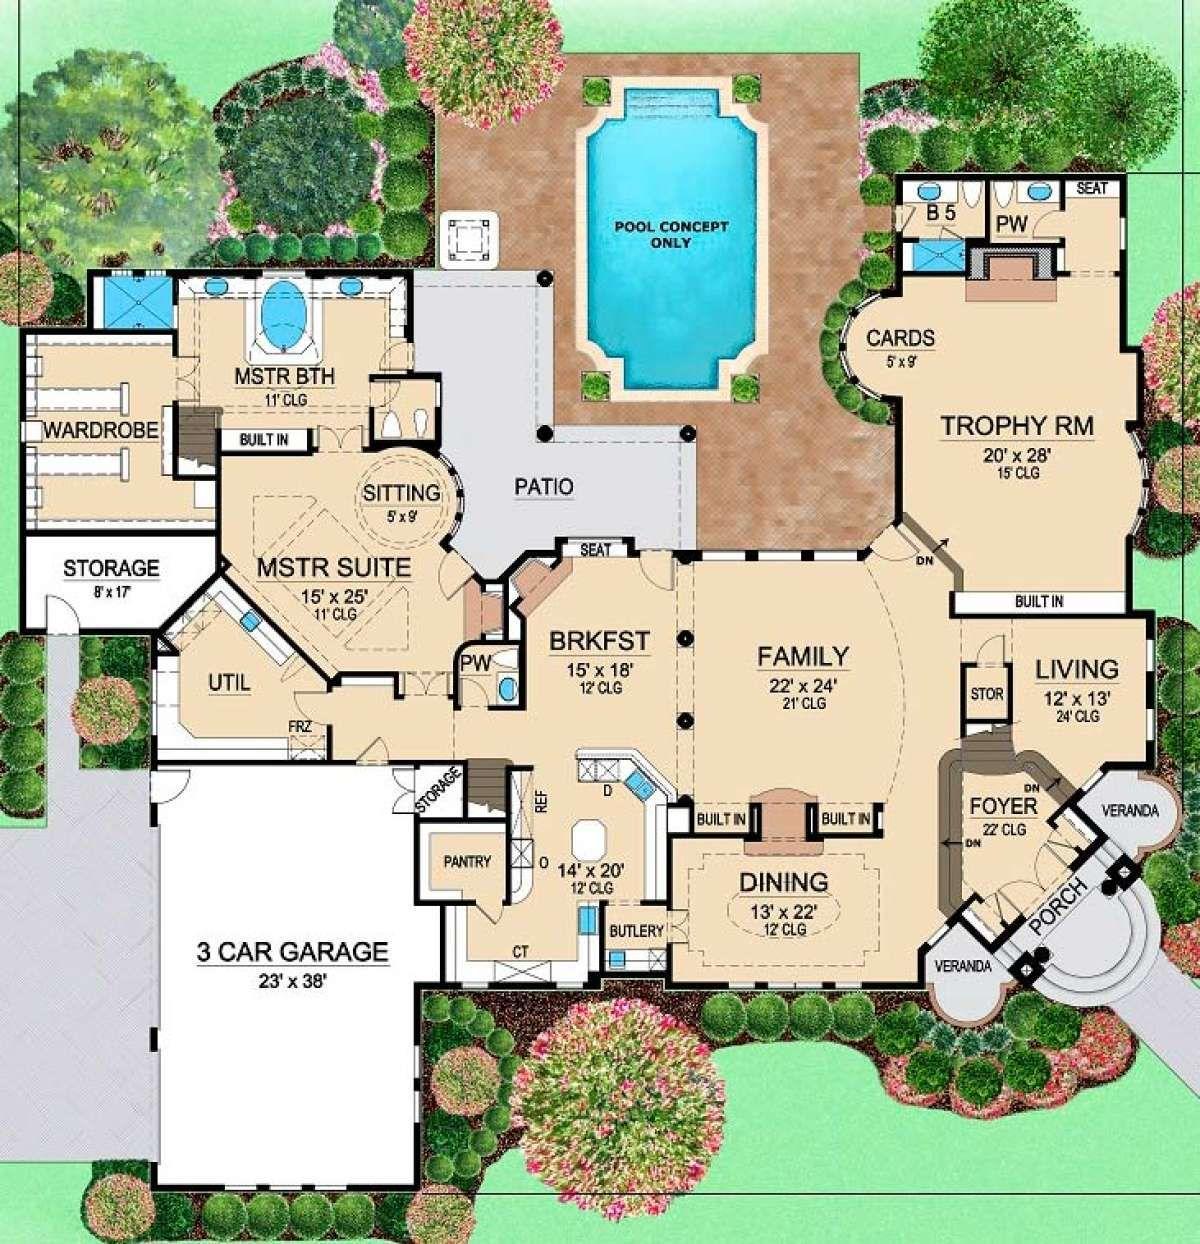 House Plan 5445 00146 Mediterranean Plan 7 199 Square Feet 4 Bedrooms 6 Bathrooms In 2021 Luxury Floor Plans House Plans Dream House Plans